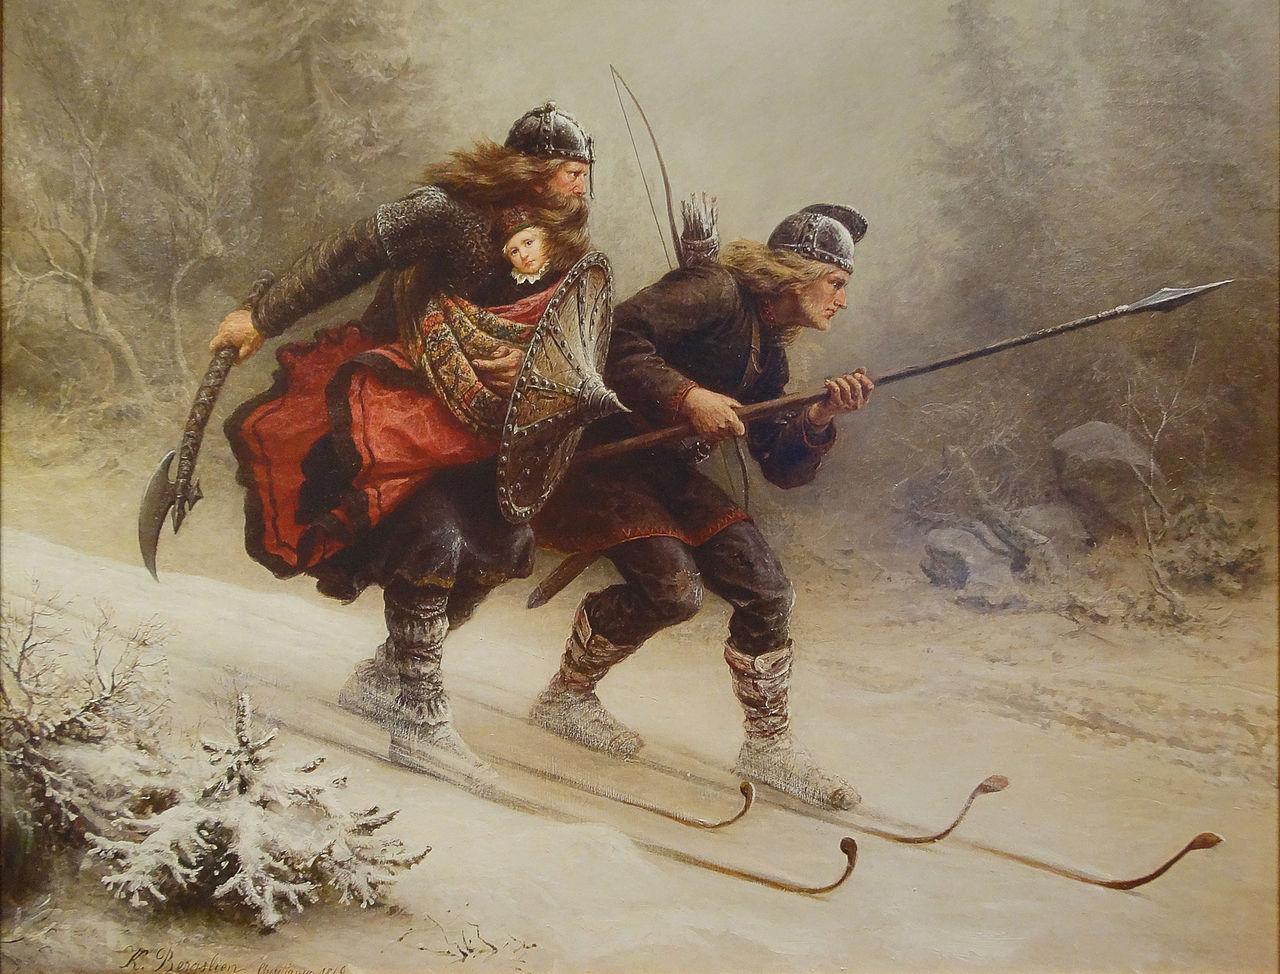 Knud Bergslien - Birkebeinerne på Ski over Fjeldet med Kongsbarnet. The Ski Museum. Holmenkollen, Oslo, Norway.